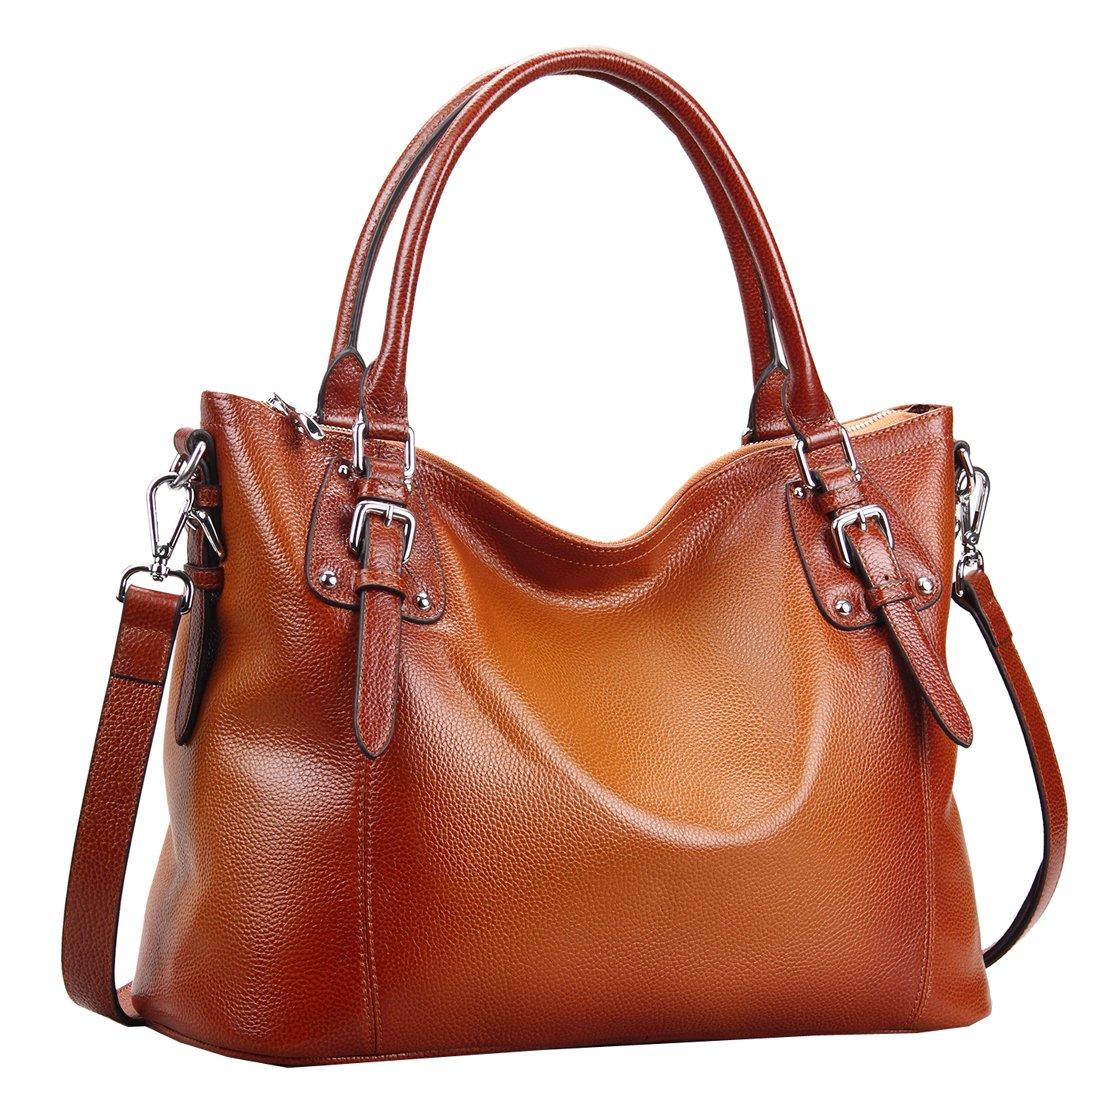 Heshe Women's Leather Handbags Shoulder Tote Bag Top Handle Bags Satchel Designer Ladies Purses Cross-body Bag (LSorrel)